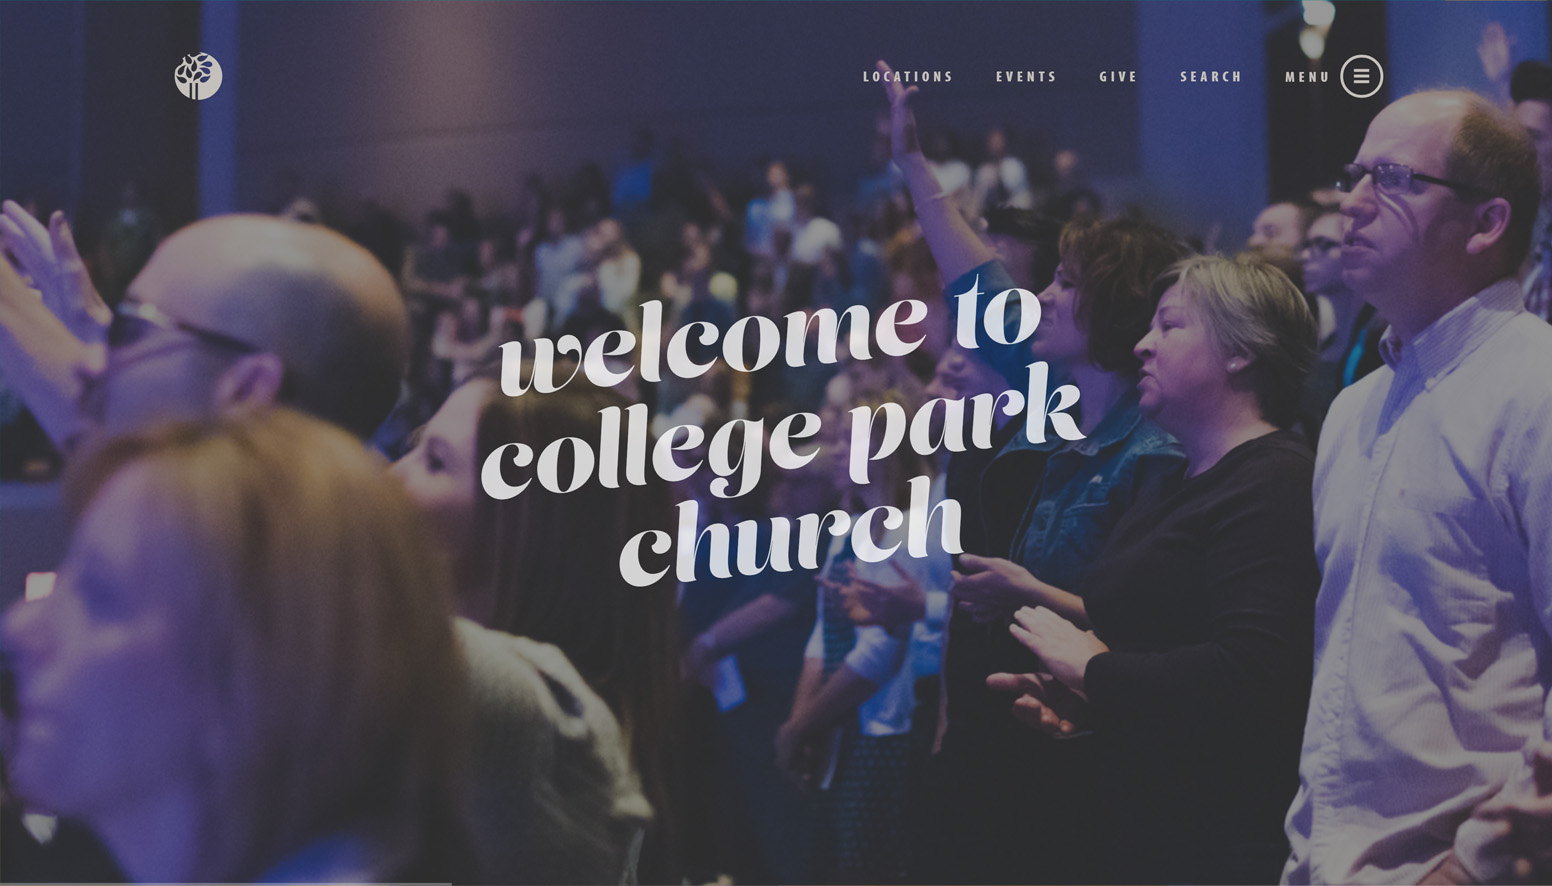 College Park Church Website